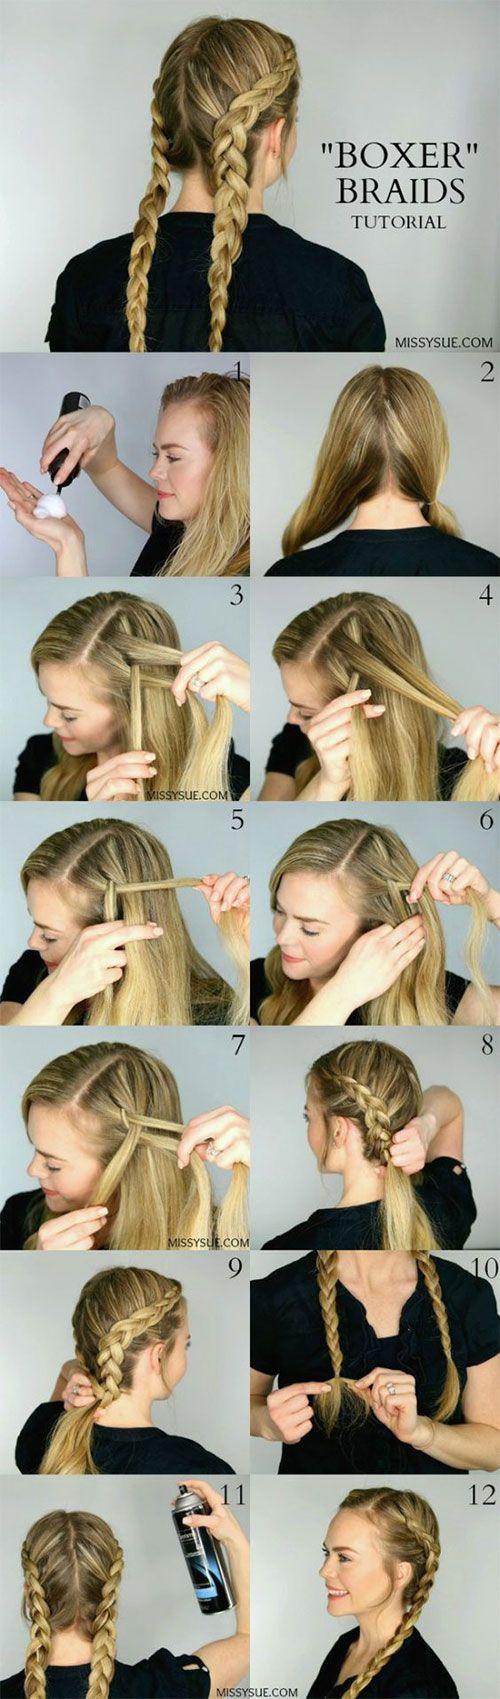 Boxer braid tutorial hair u beauty pinterest boxer braids